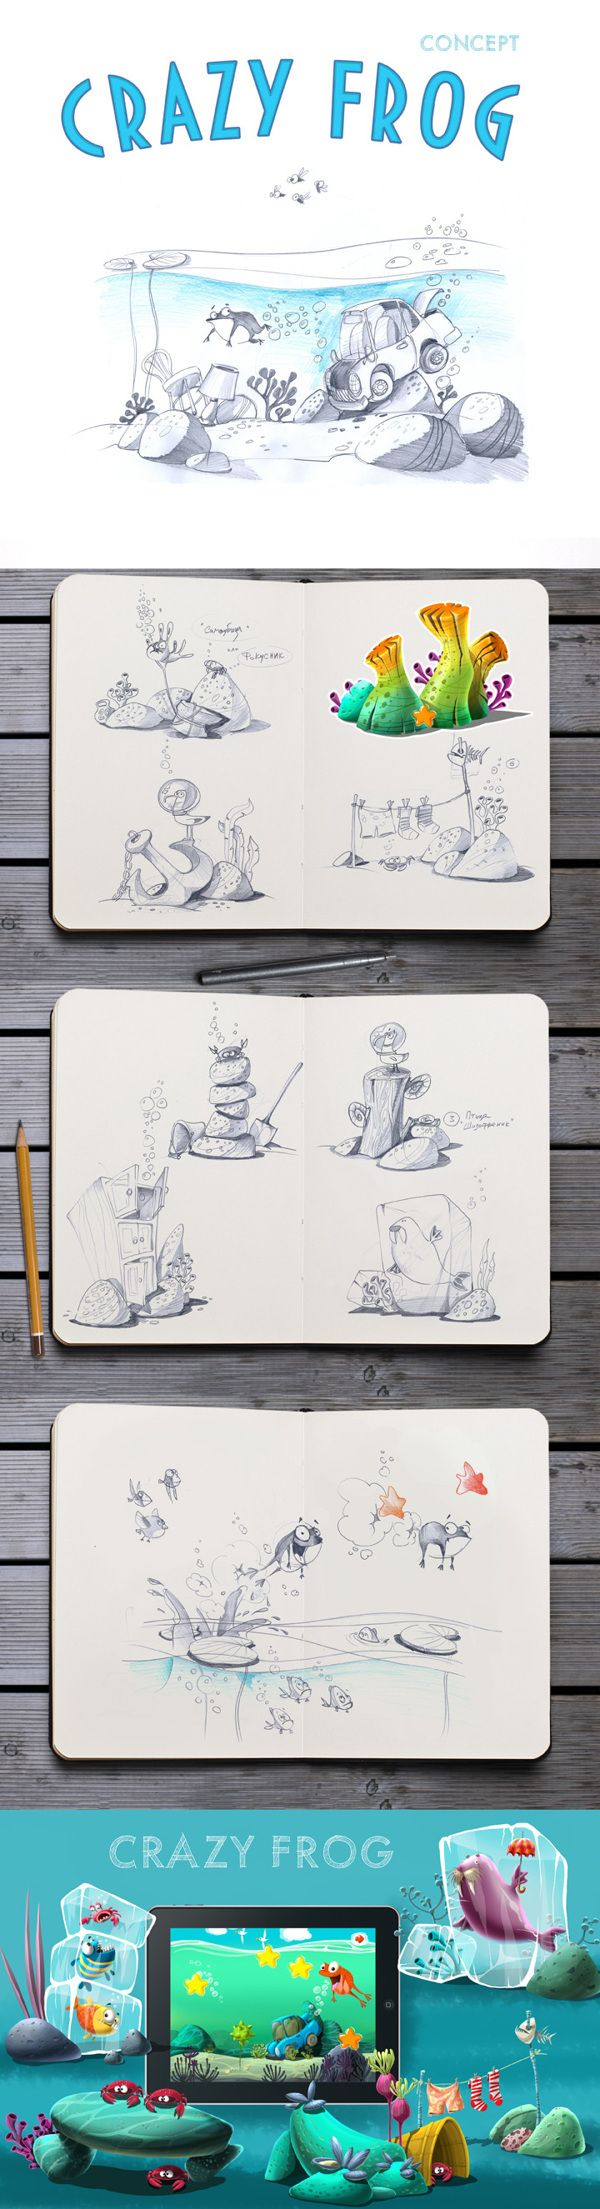 Crazy Frog: Concept ...